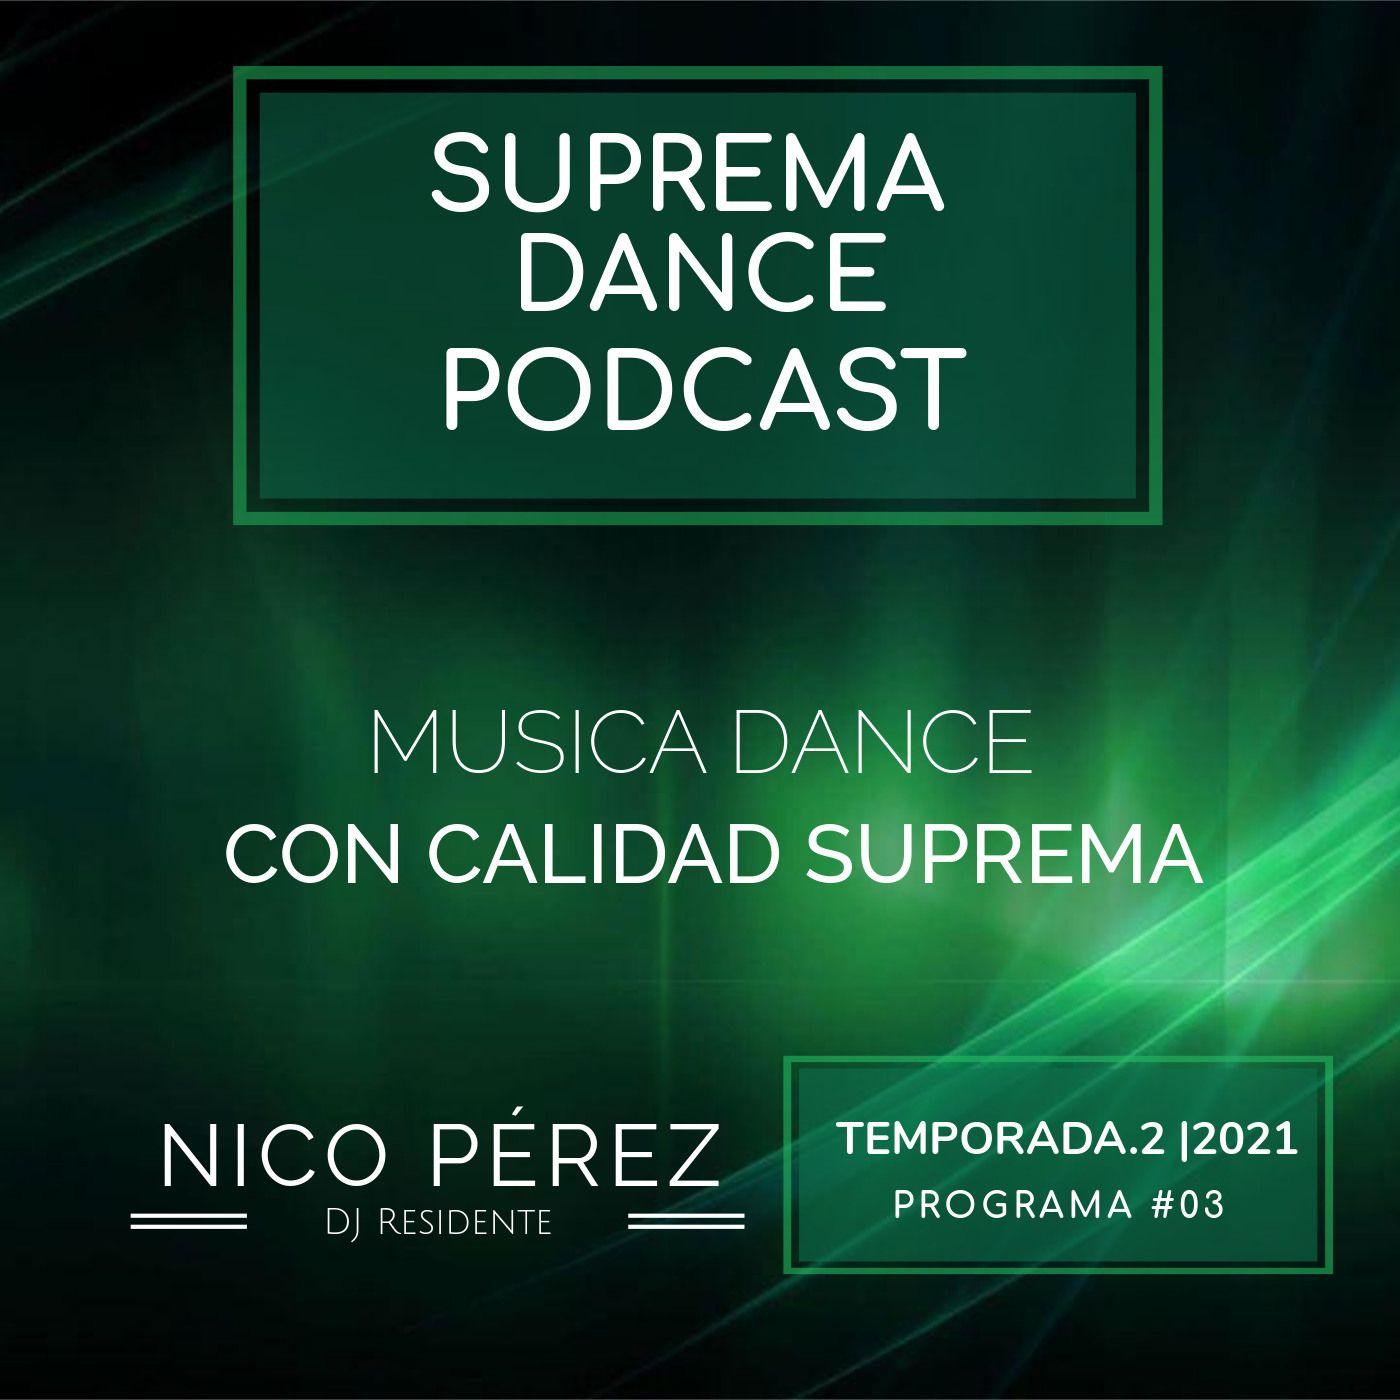 DJ Residente Nico Pérez | Programa-3 | T.2 | SDP